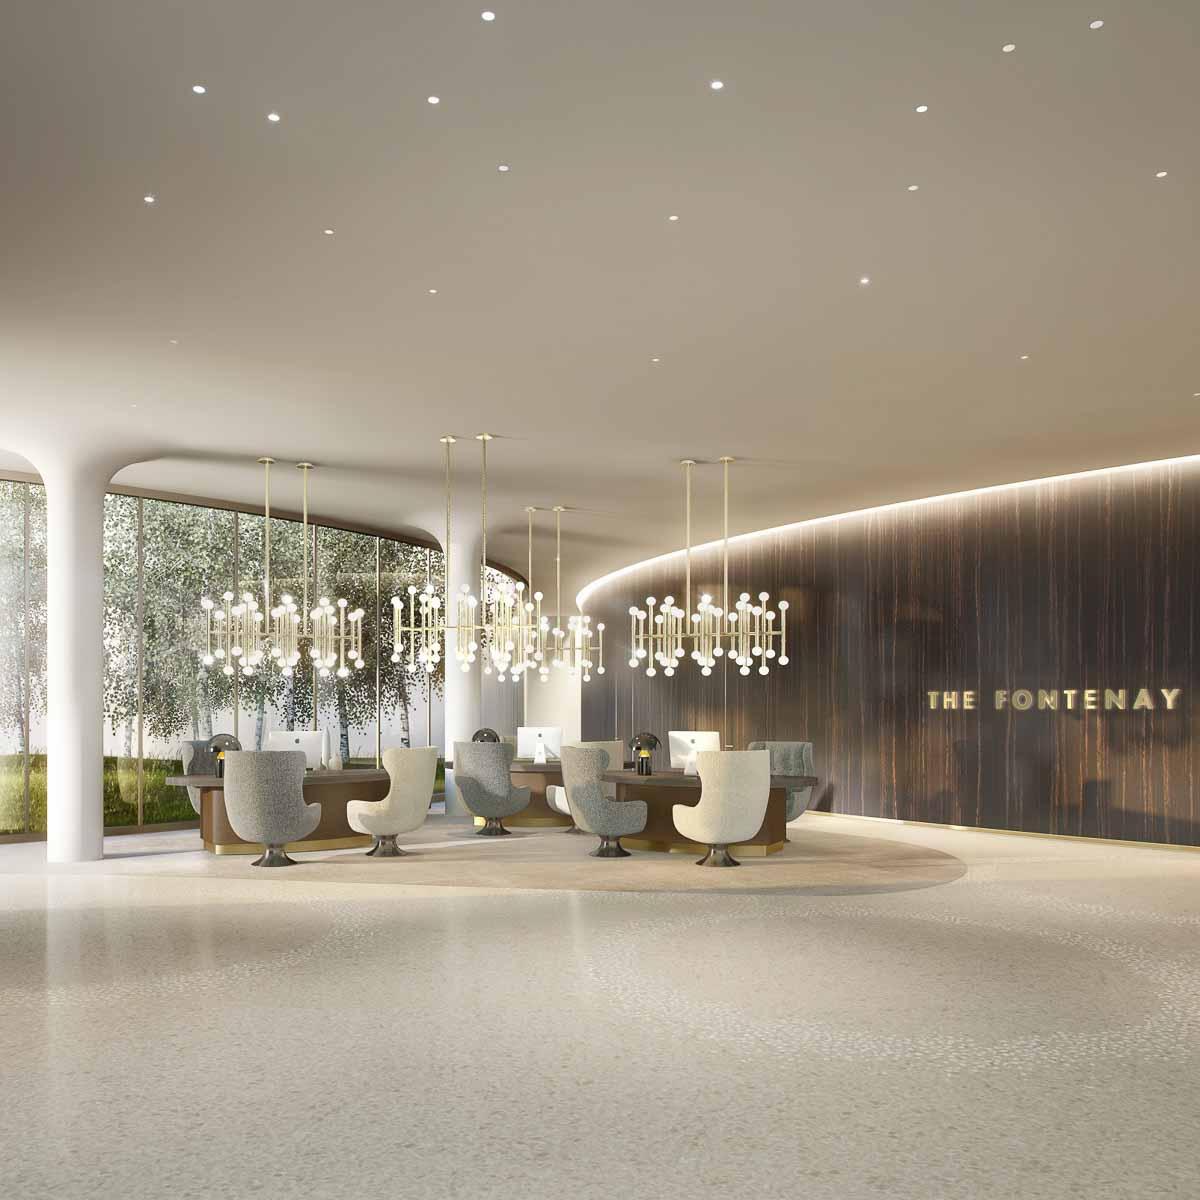 The Fontenay Hotel Hamburg